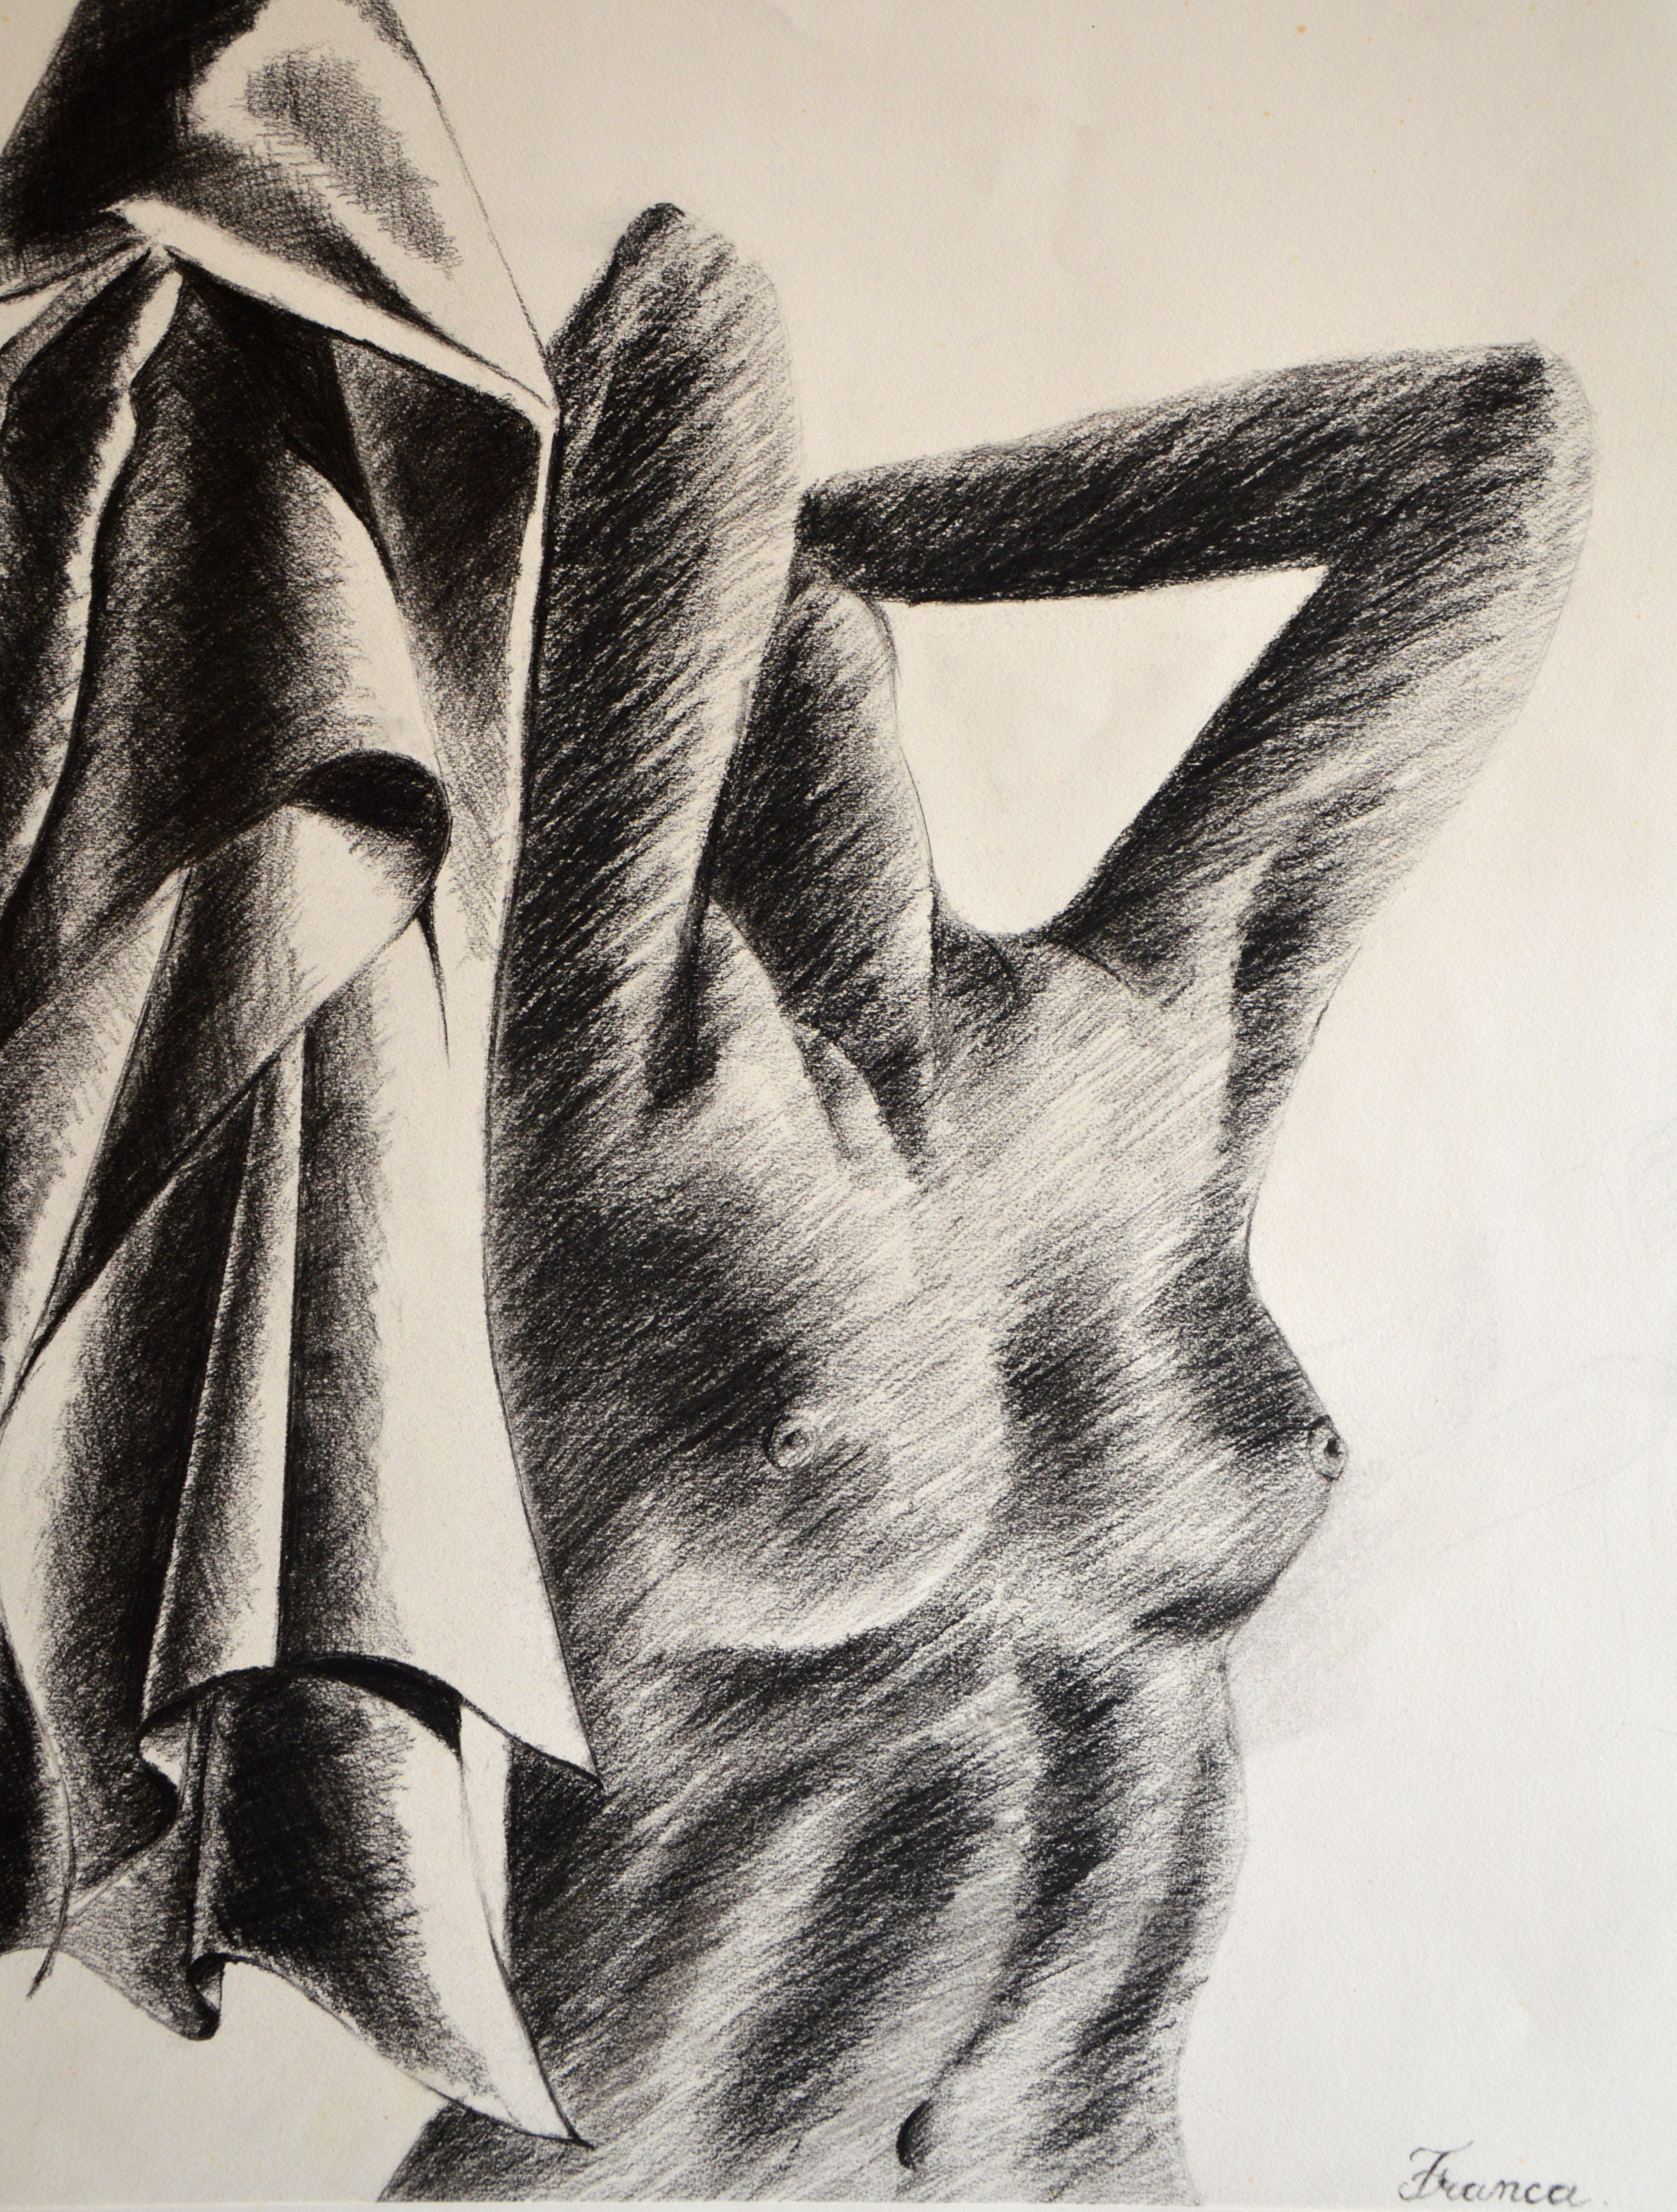 Buste de femme n°1 (Oeuvre n°117)